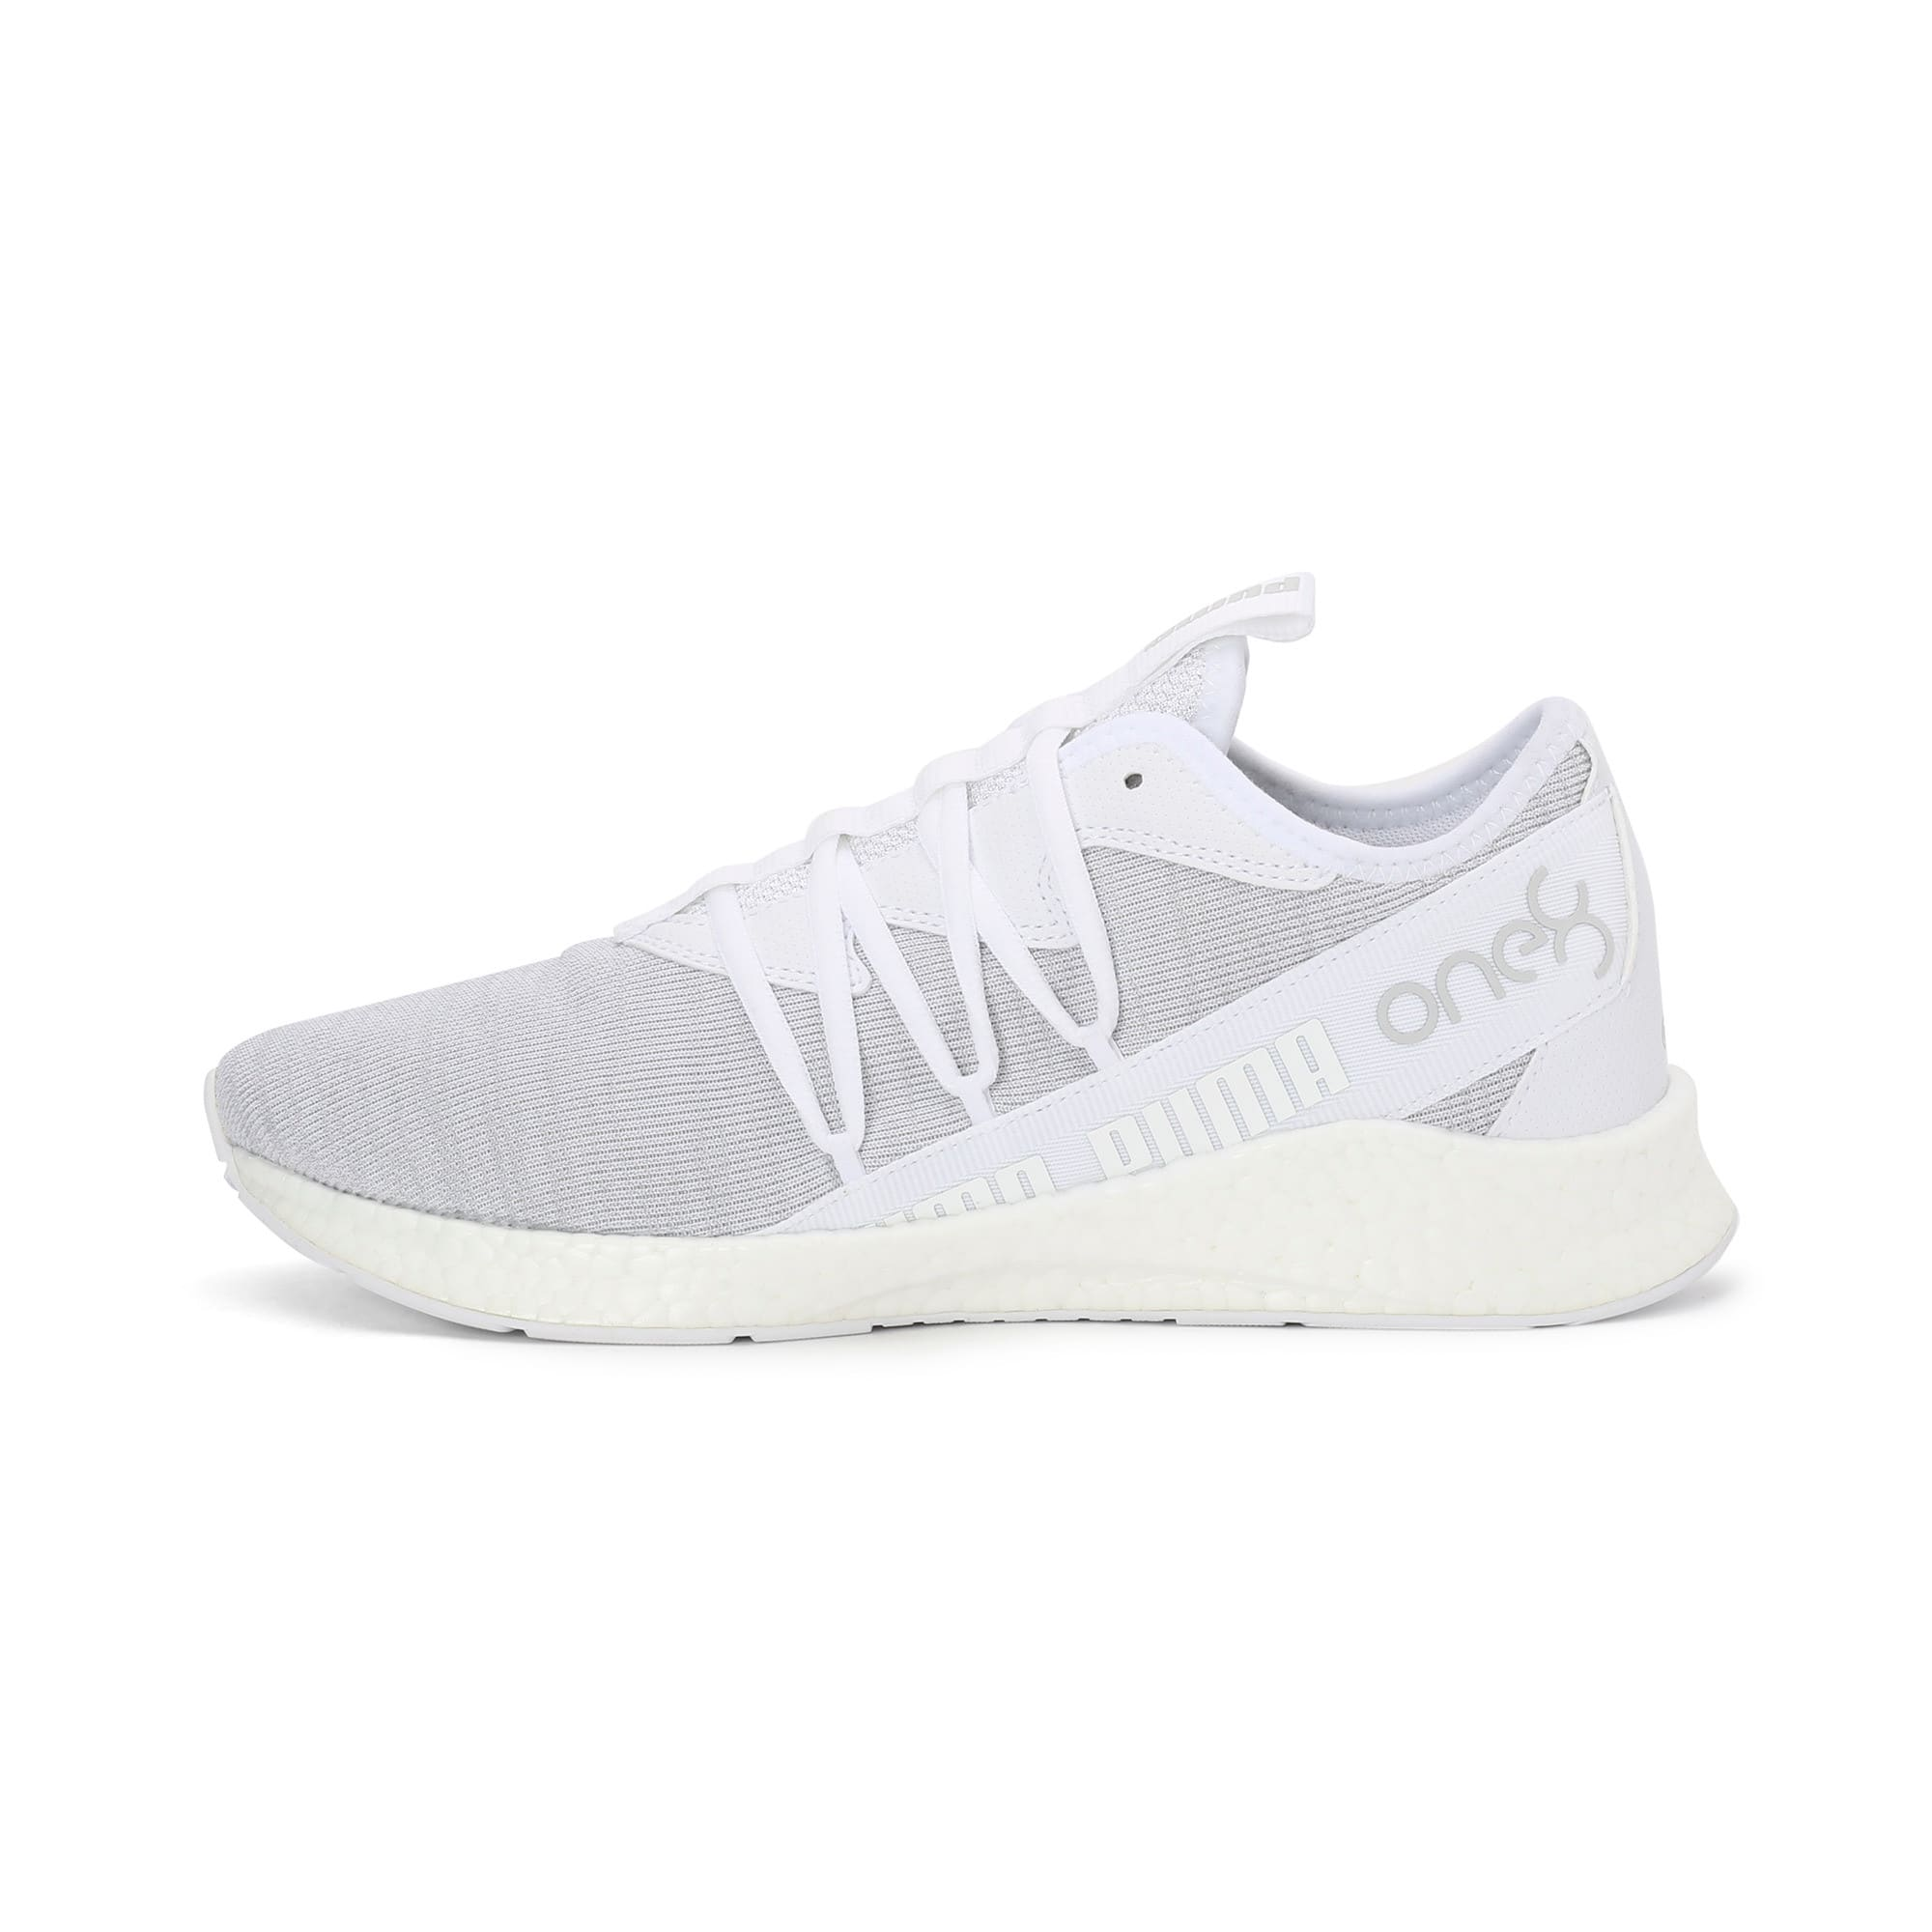 Thumbnail 1 of NRGY Star Knit one8 Unisex Running Shoes, Puma White-Glacier Gray, medium-IND